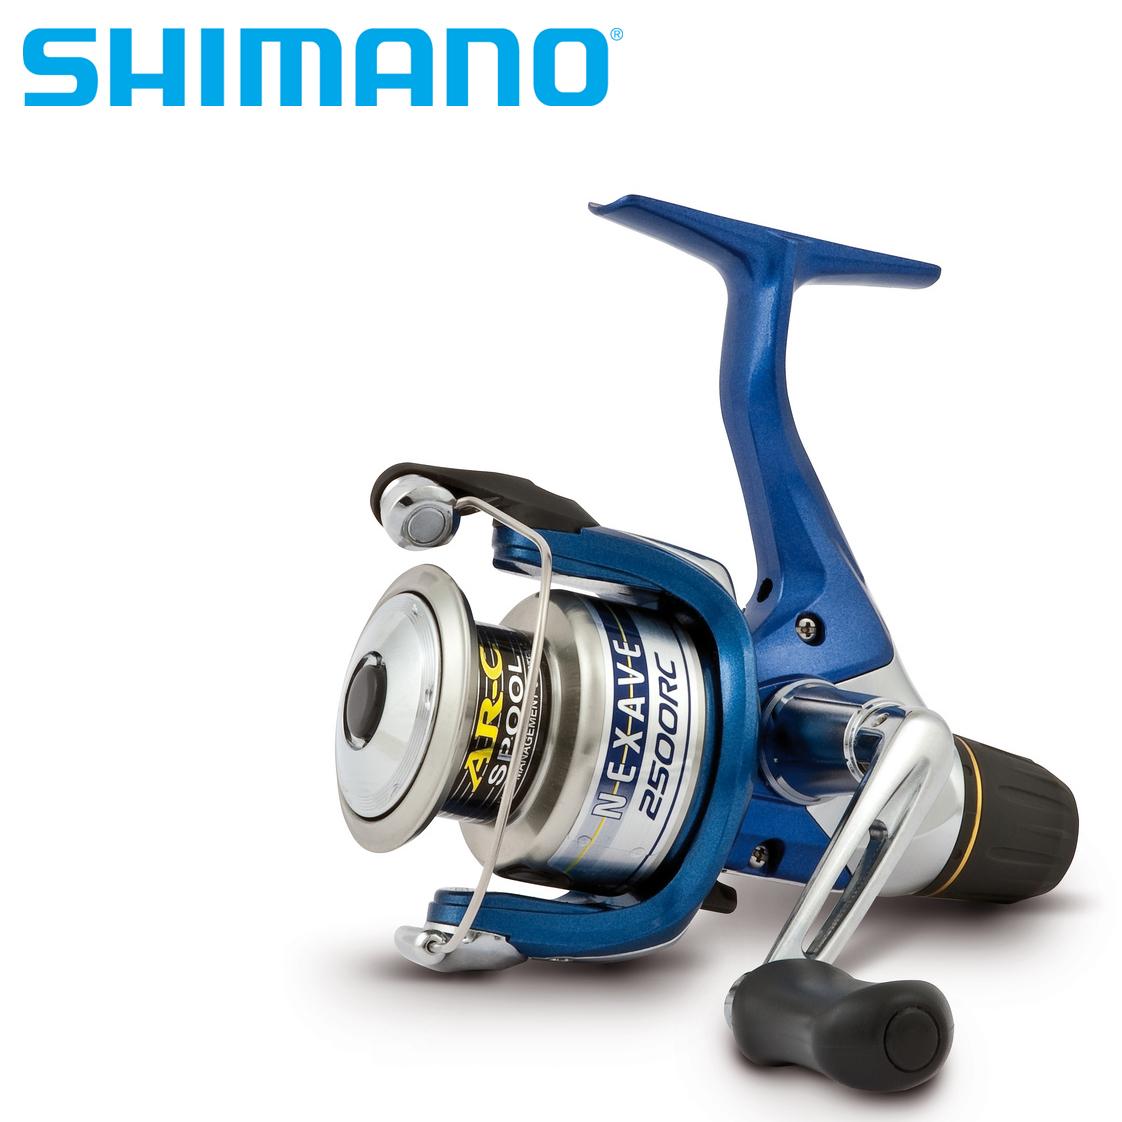 Катушка безынерционная SHIMANO NEXAVE 2500 RC